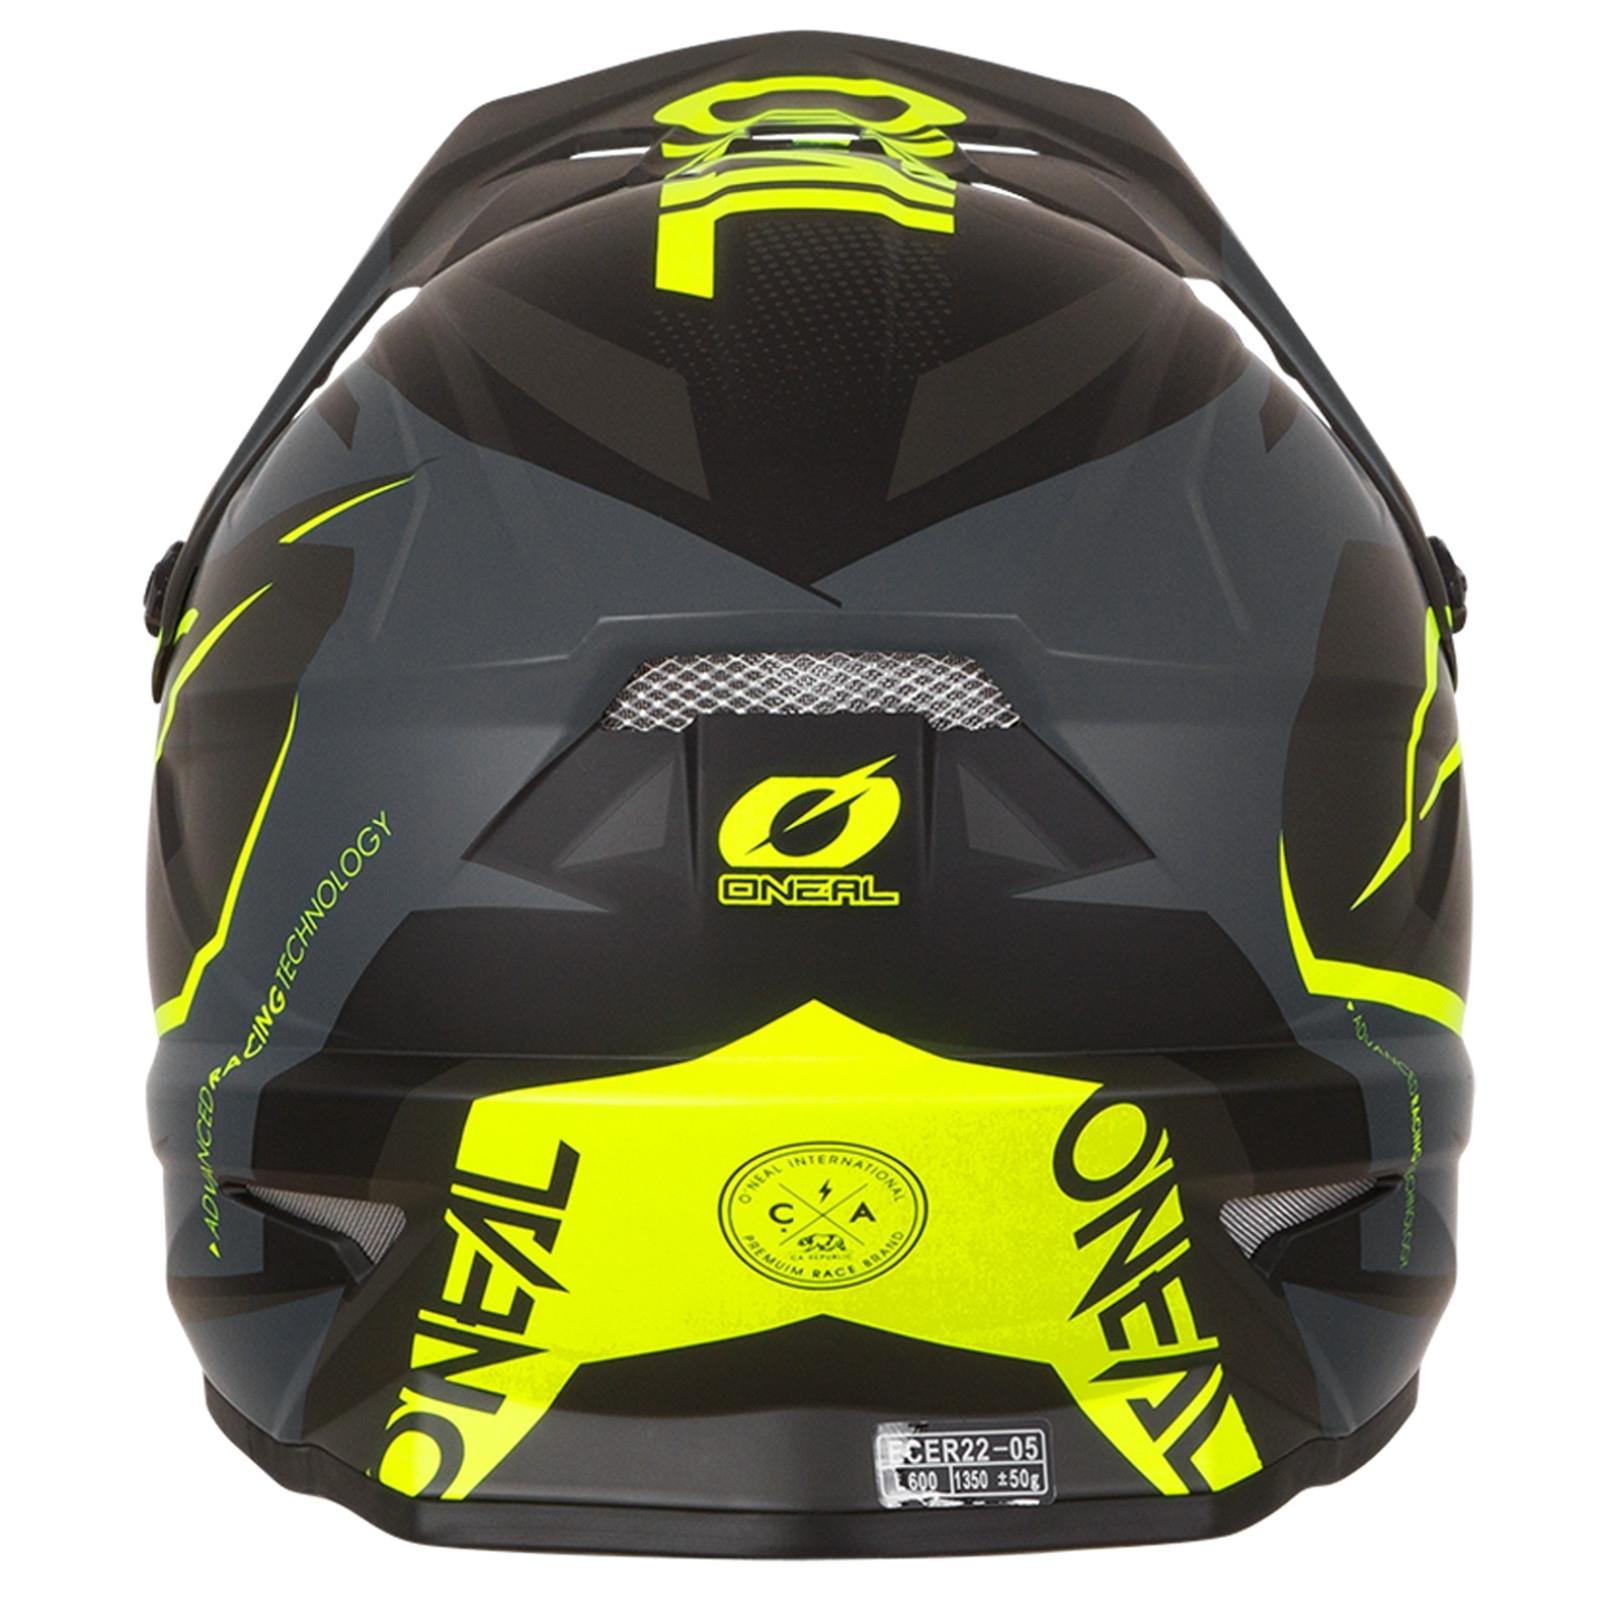 ONeal-Motocross-casco-MX-ENDURO-MOTO-BICI-FUORISTRADA-CROSS-Series-Adventure miniatura 47